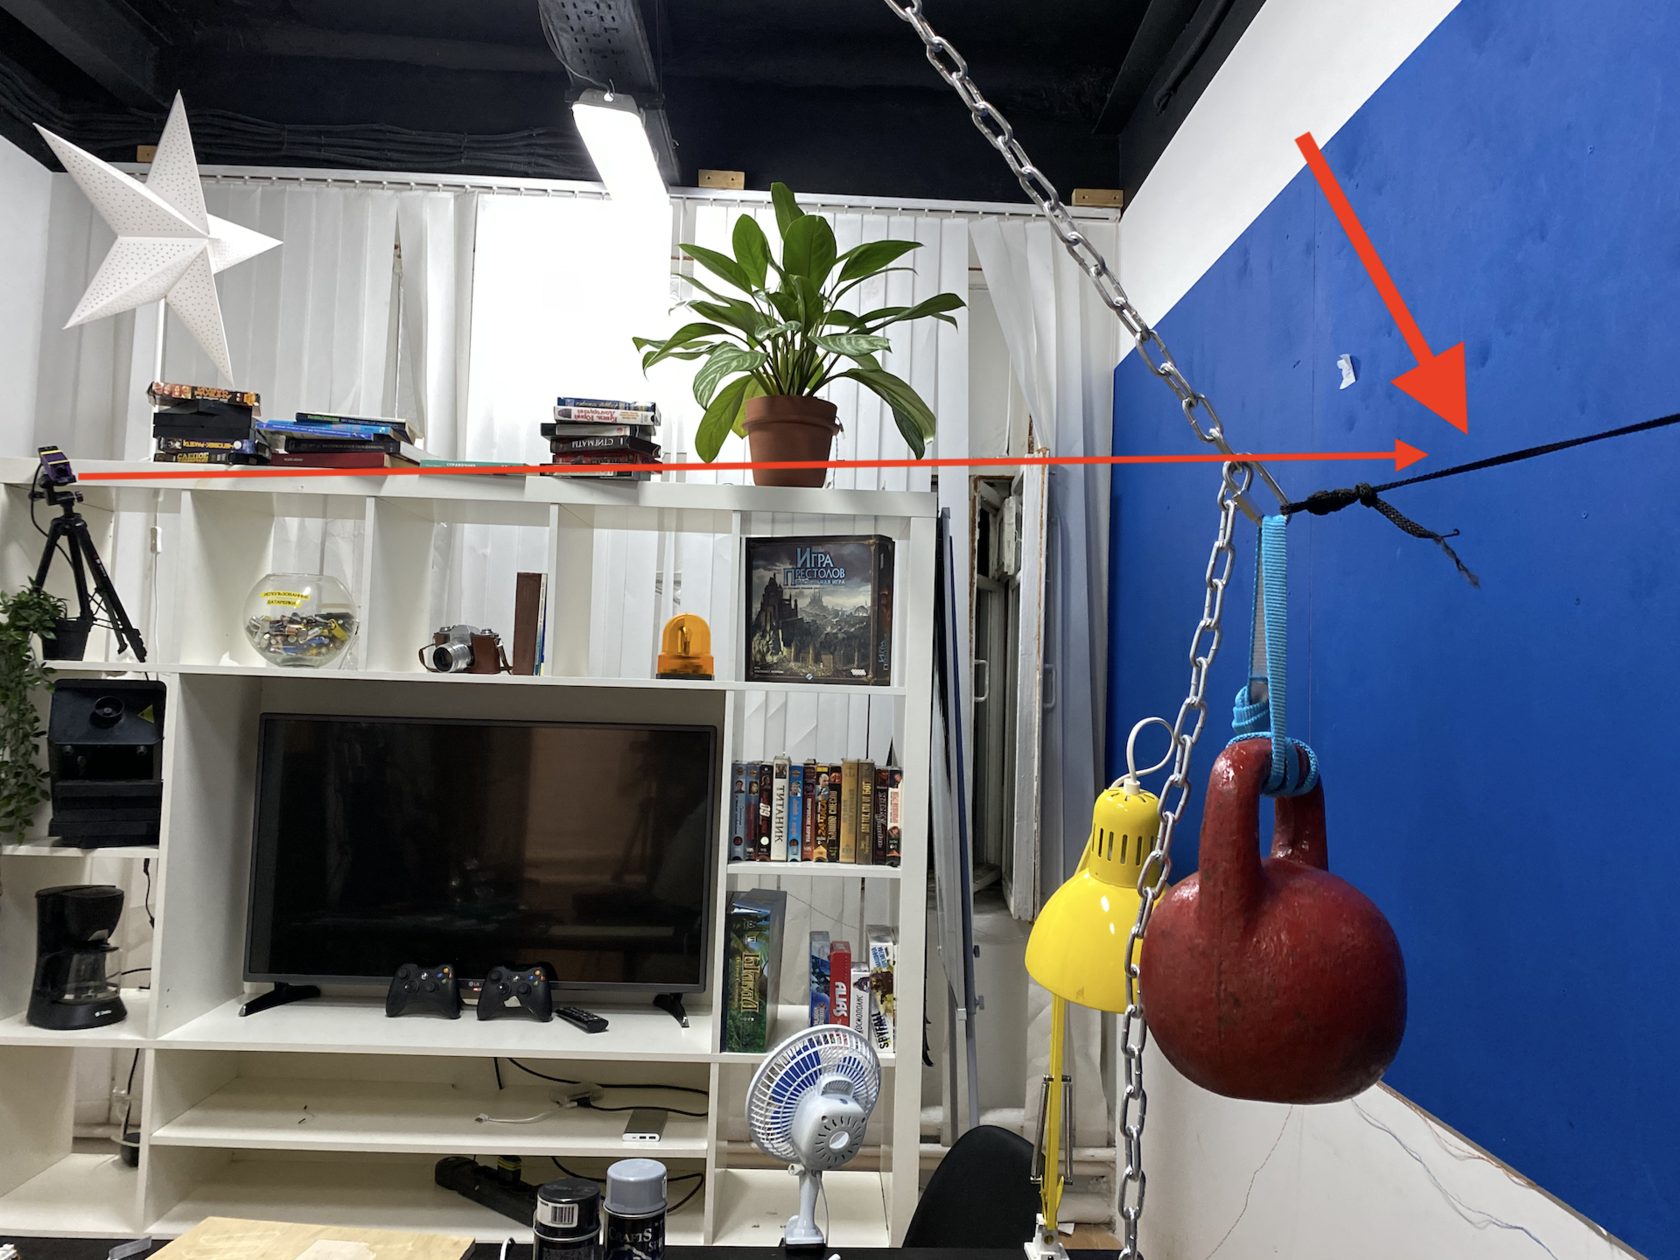 Железо проекта: как мы строили комнату с хакерским квестом - 9